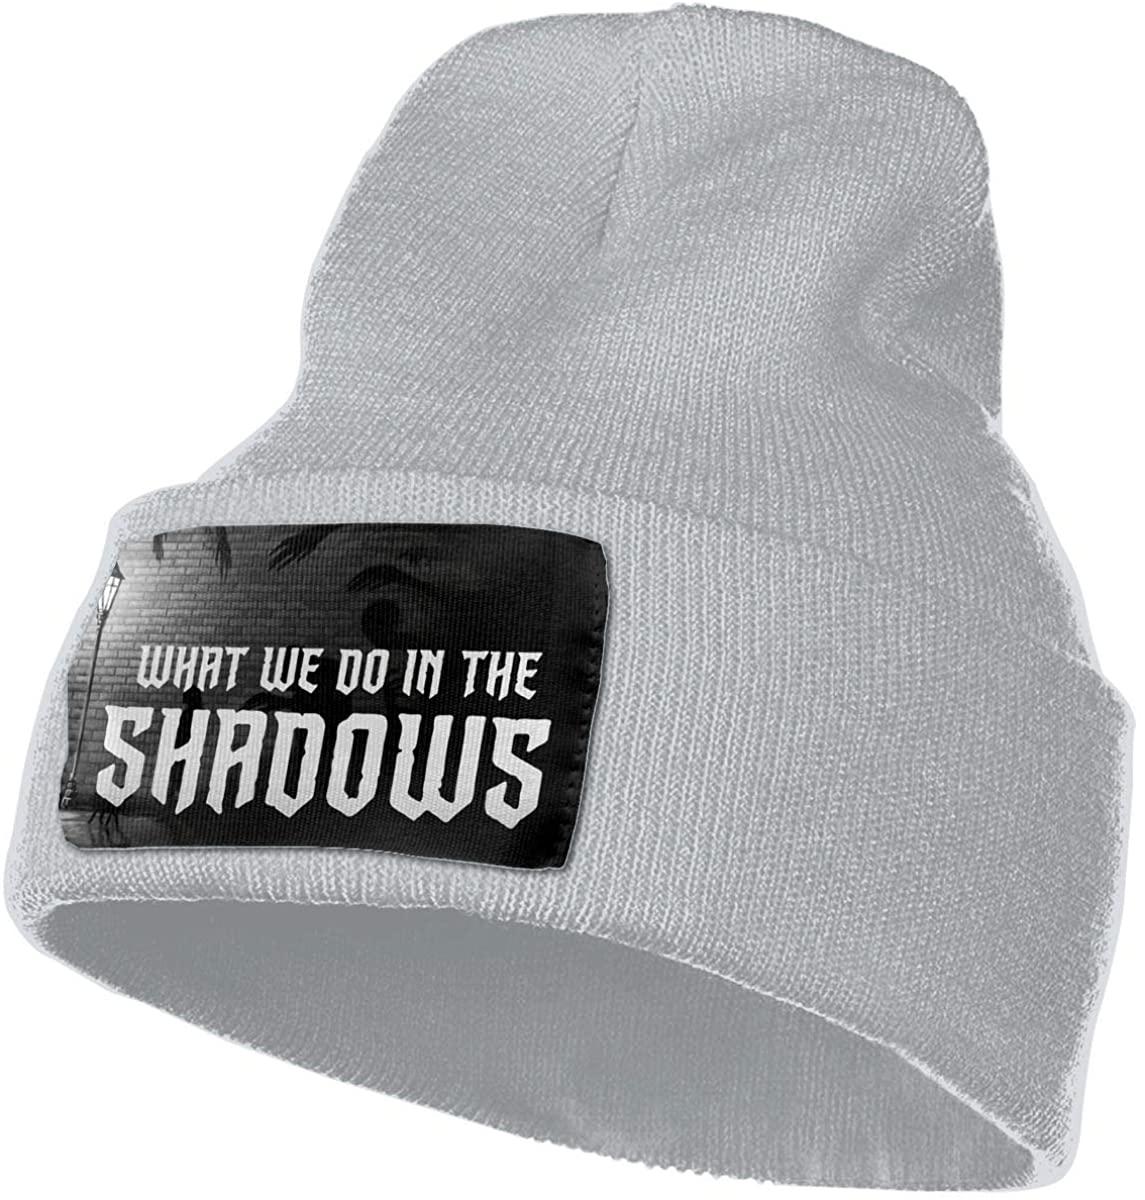 What We Do in The Sha-dows Unisex Fall Winter Warm Knit Cap Beanie Hat Stretchy Ski Cap, 18x30 cm Gray